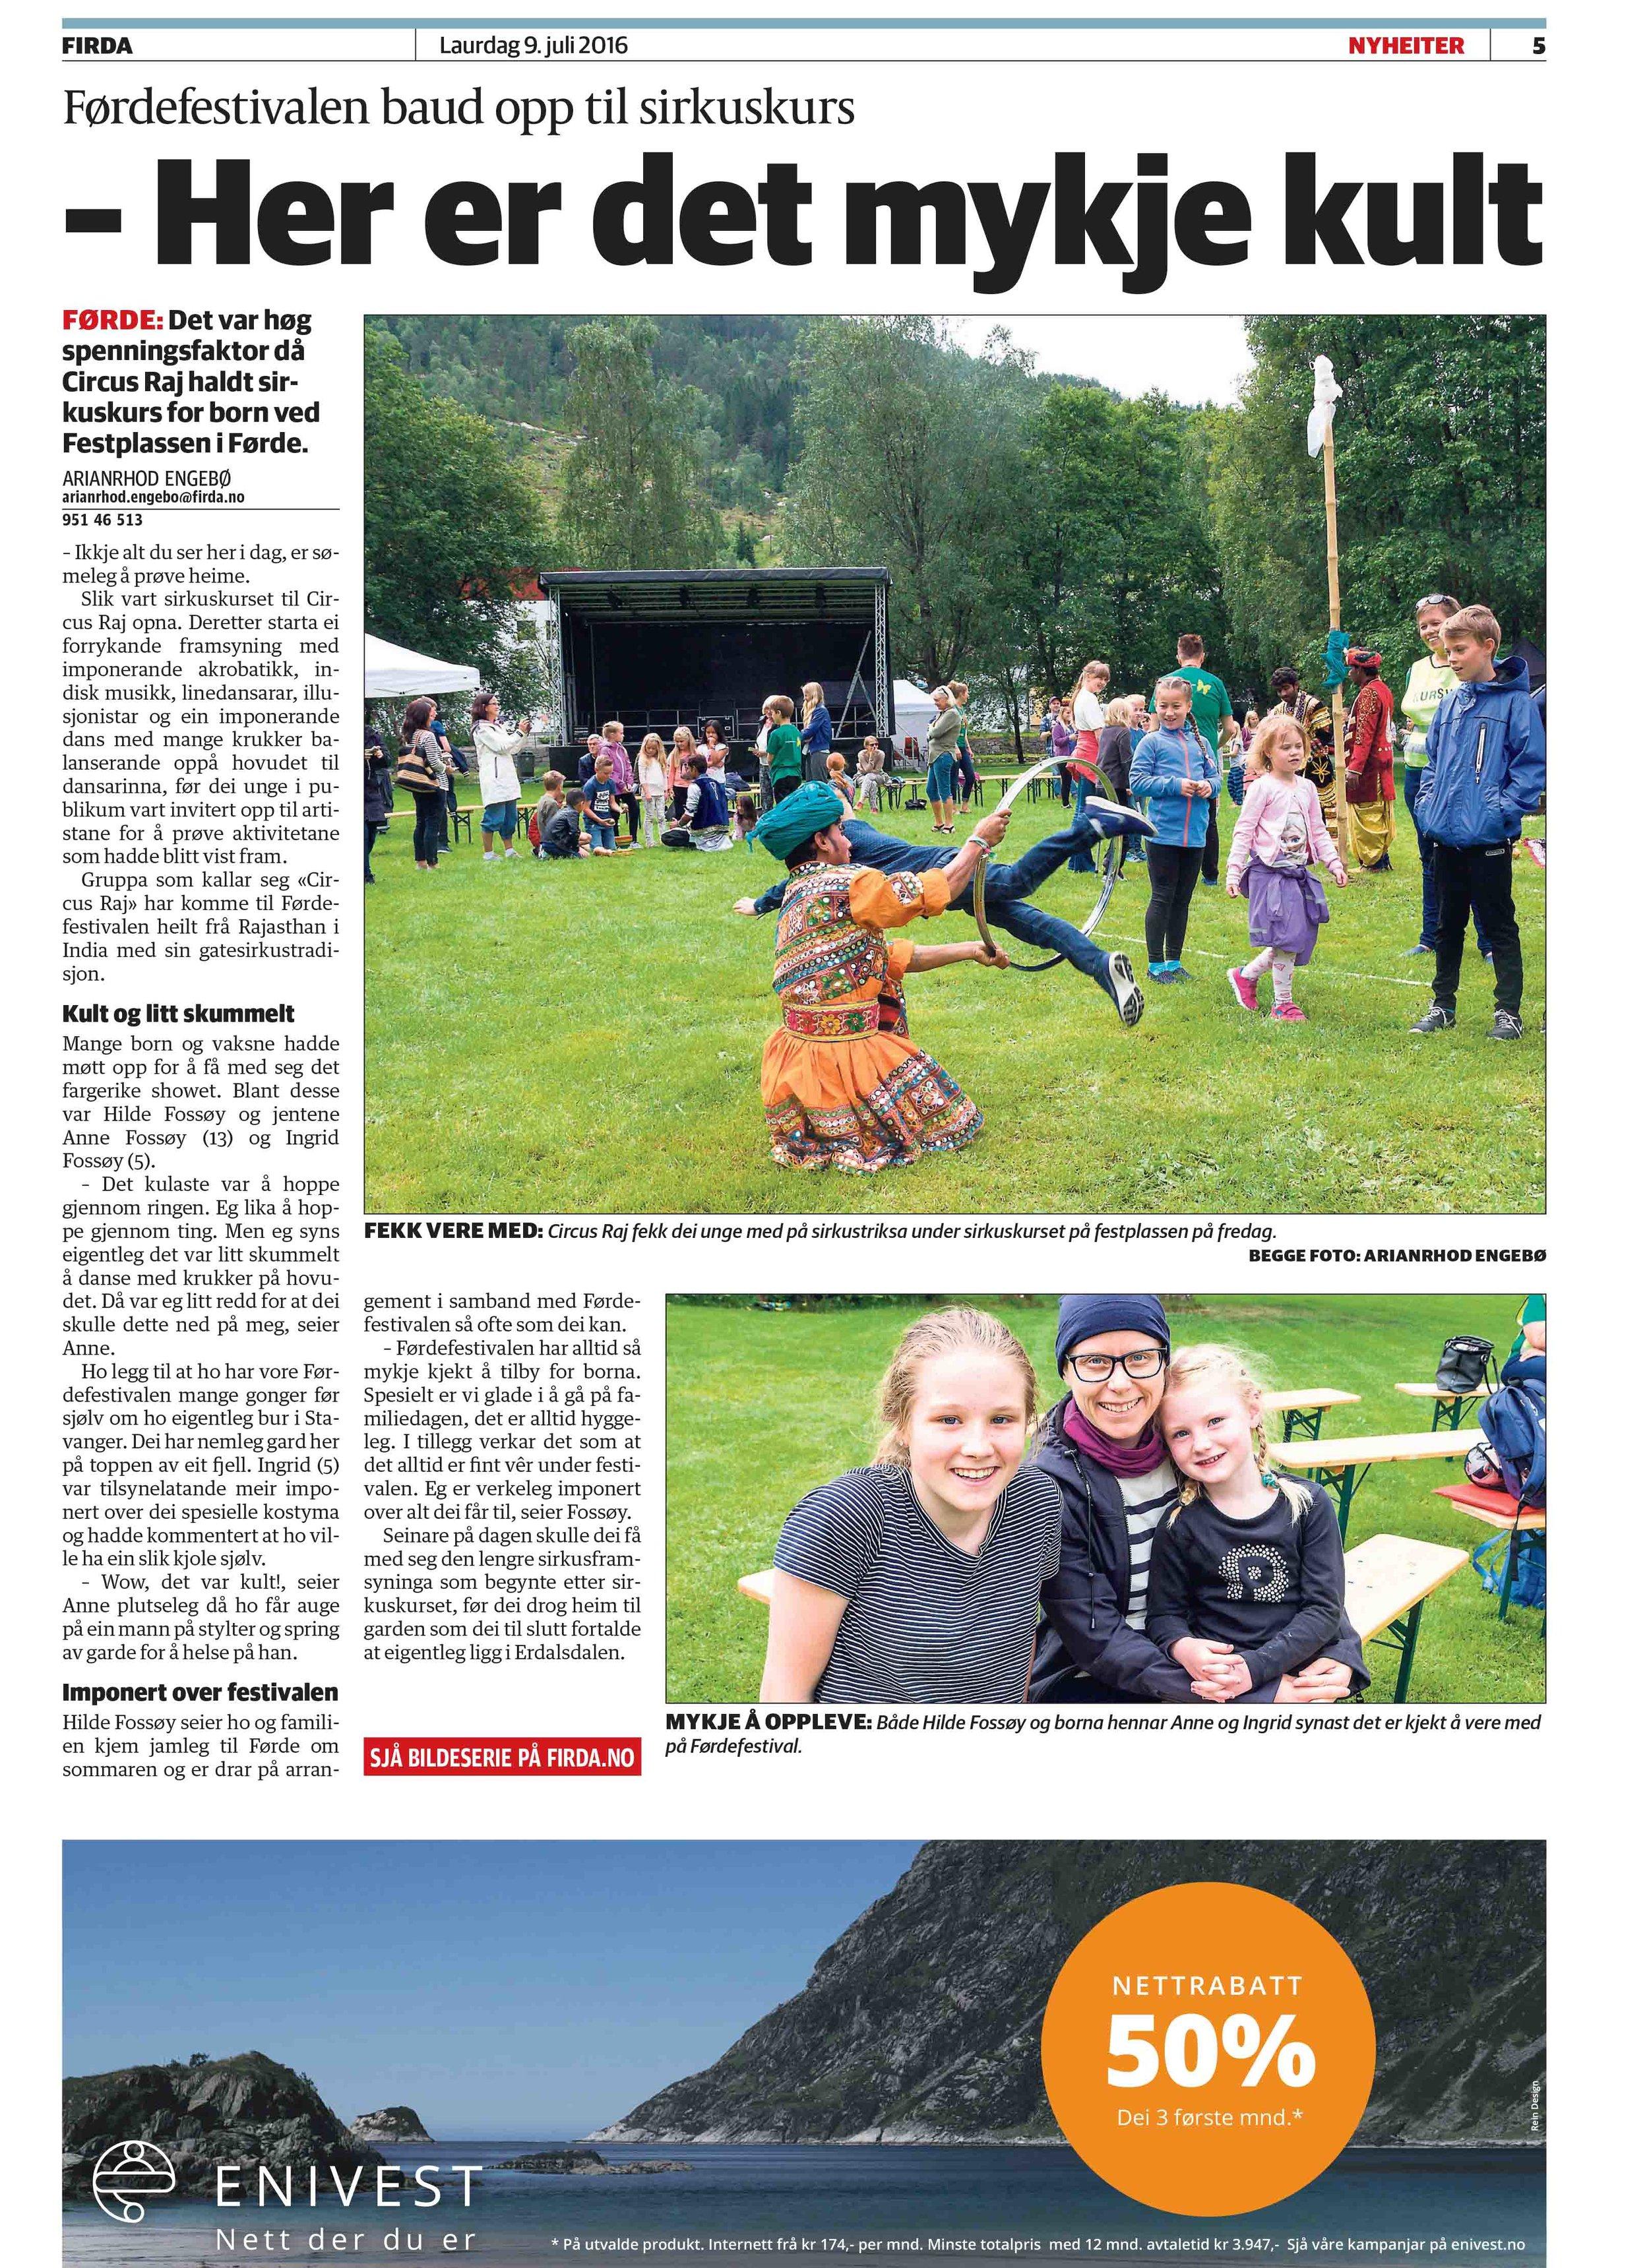 Firda_-sirkuskurs - Circus Raj_09-07-2016_print-1.jpg